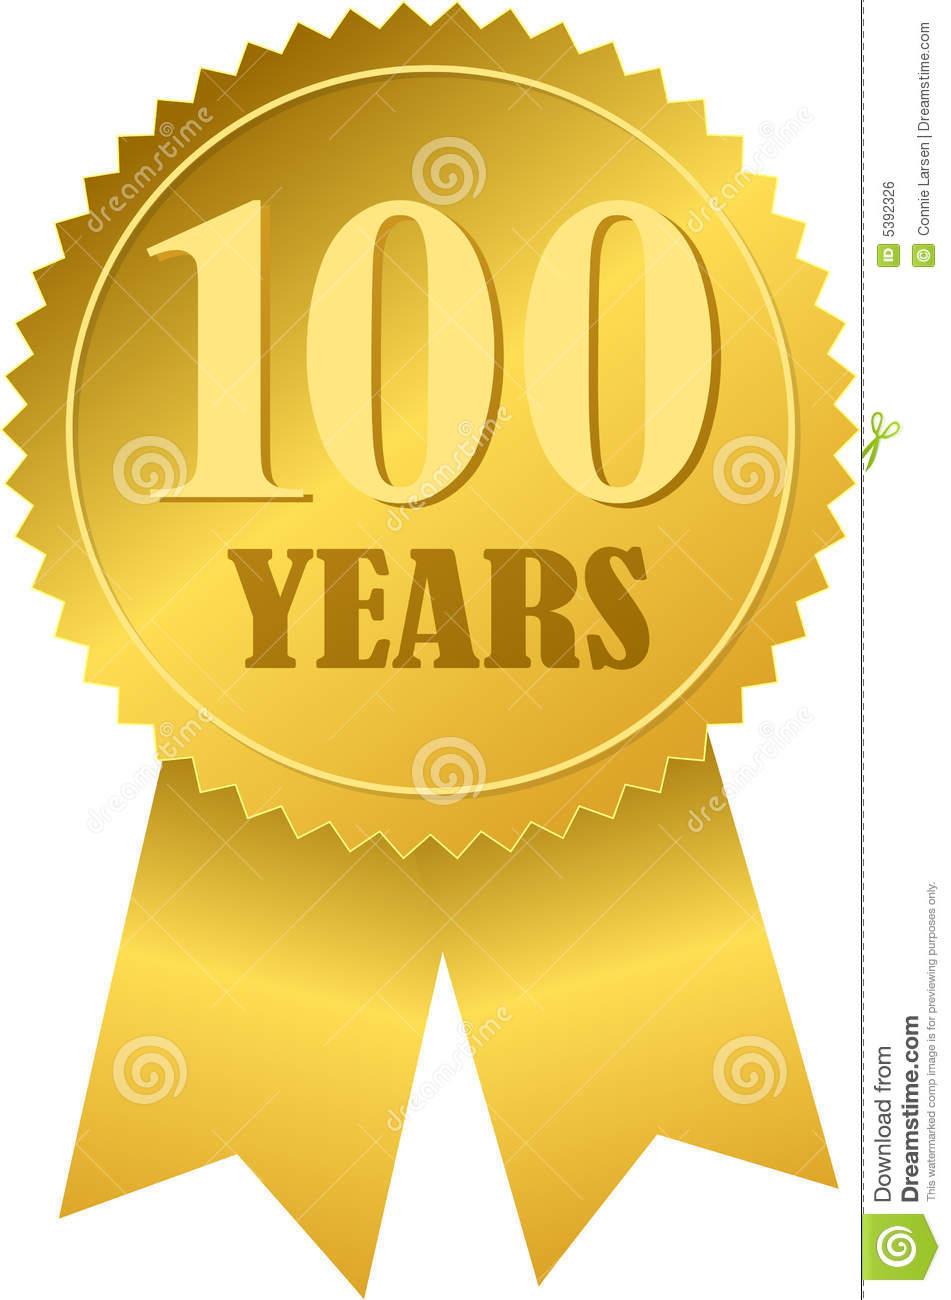 Centennial Seal And Ribbon Eps Royalty Free Stock Image Image.